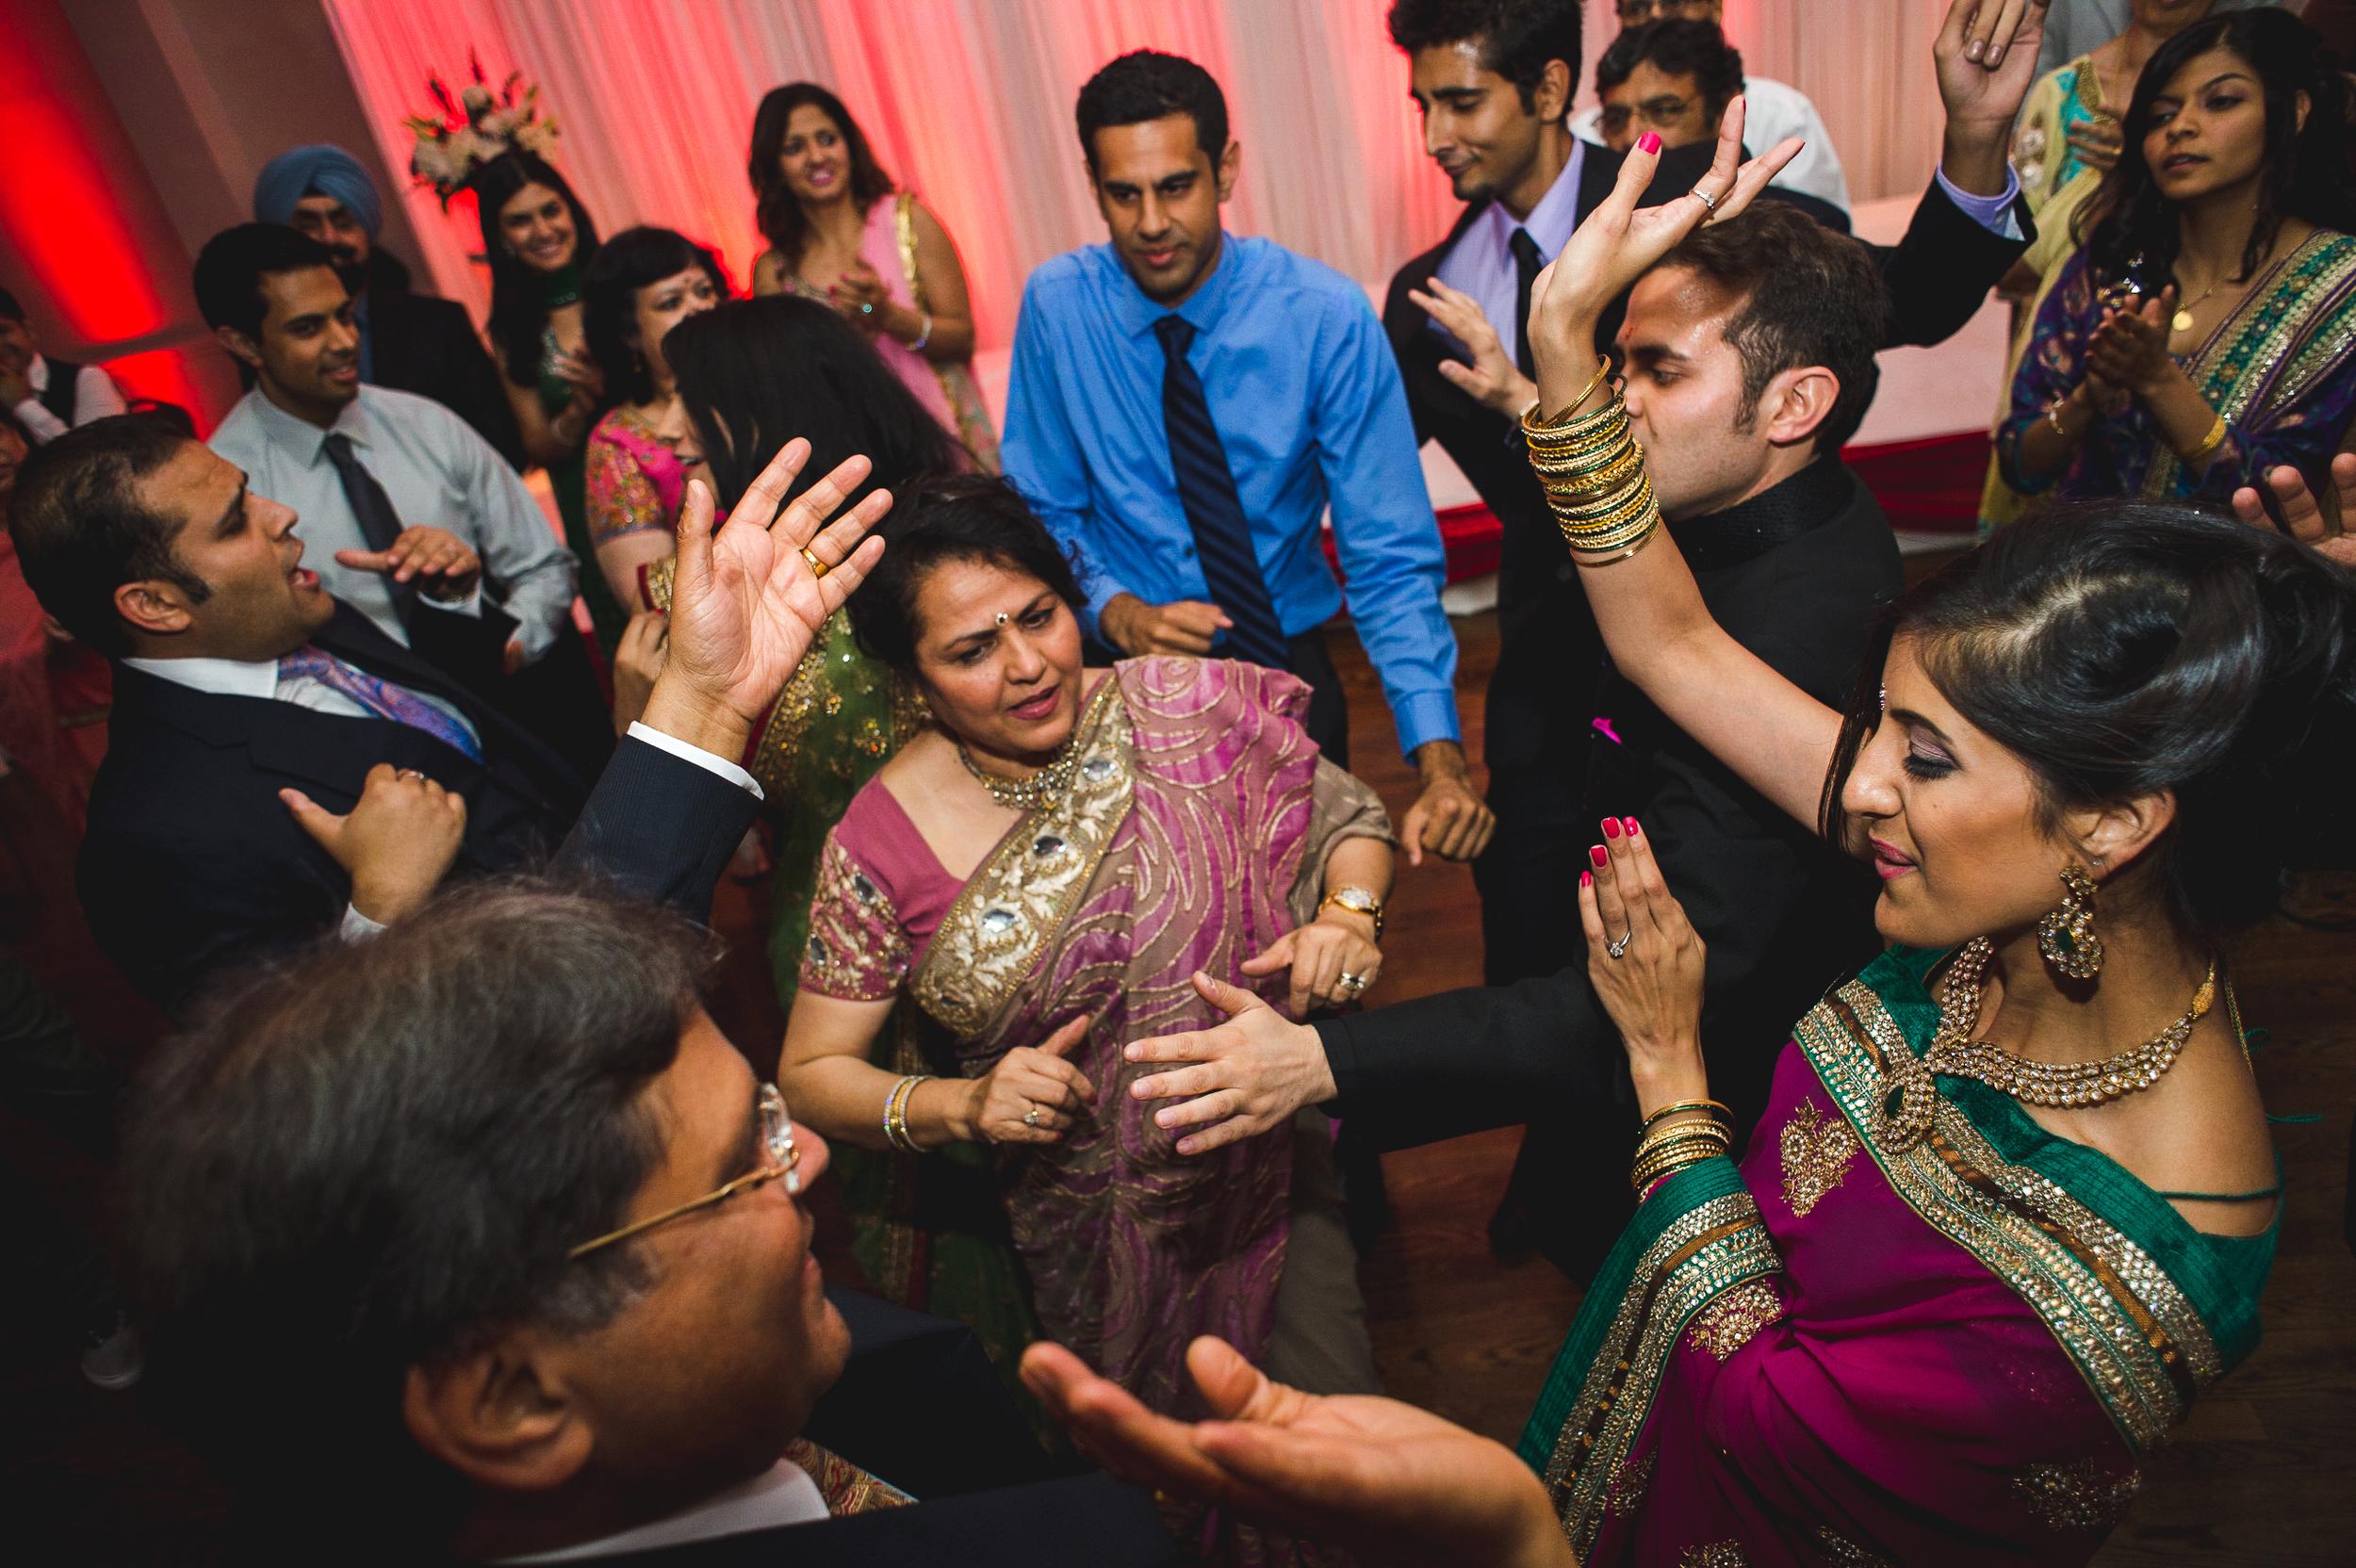 Indian wedding photographer washington dc Mantas Kubilinskas-18.jpg